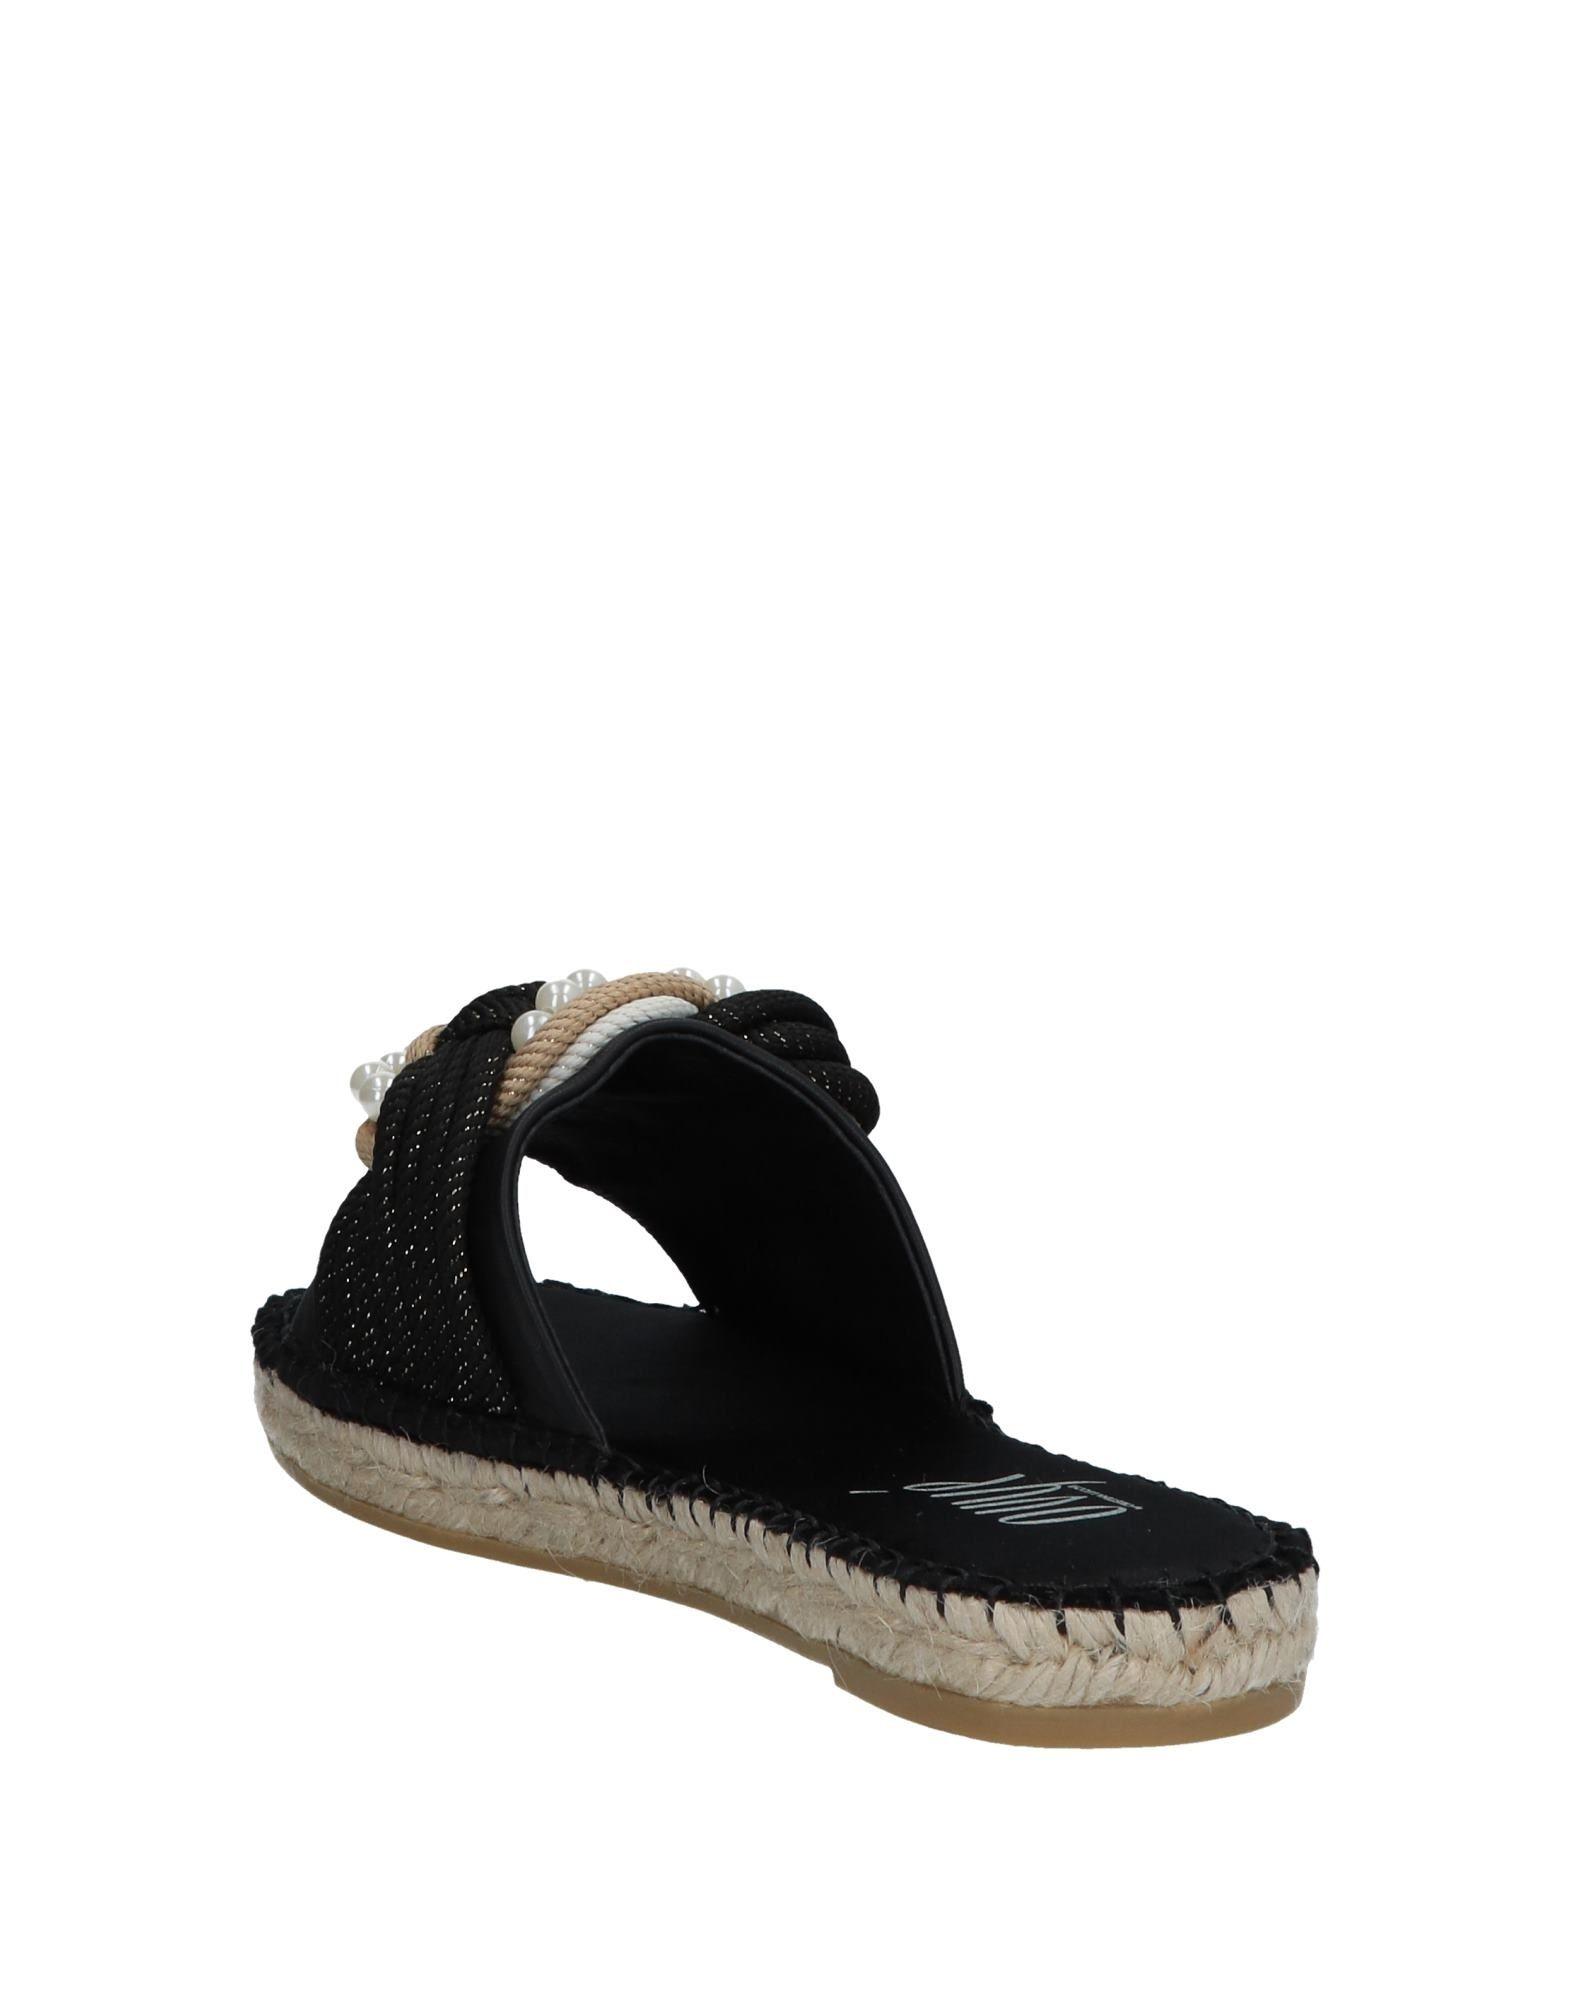 ovye & # # # 39; par cristina lucchi sandales - femmes ovye & # 39; par cristina lucchi 11569412sk sandales en ligne le royaume - uni - 18835e